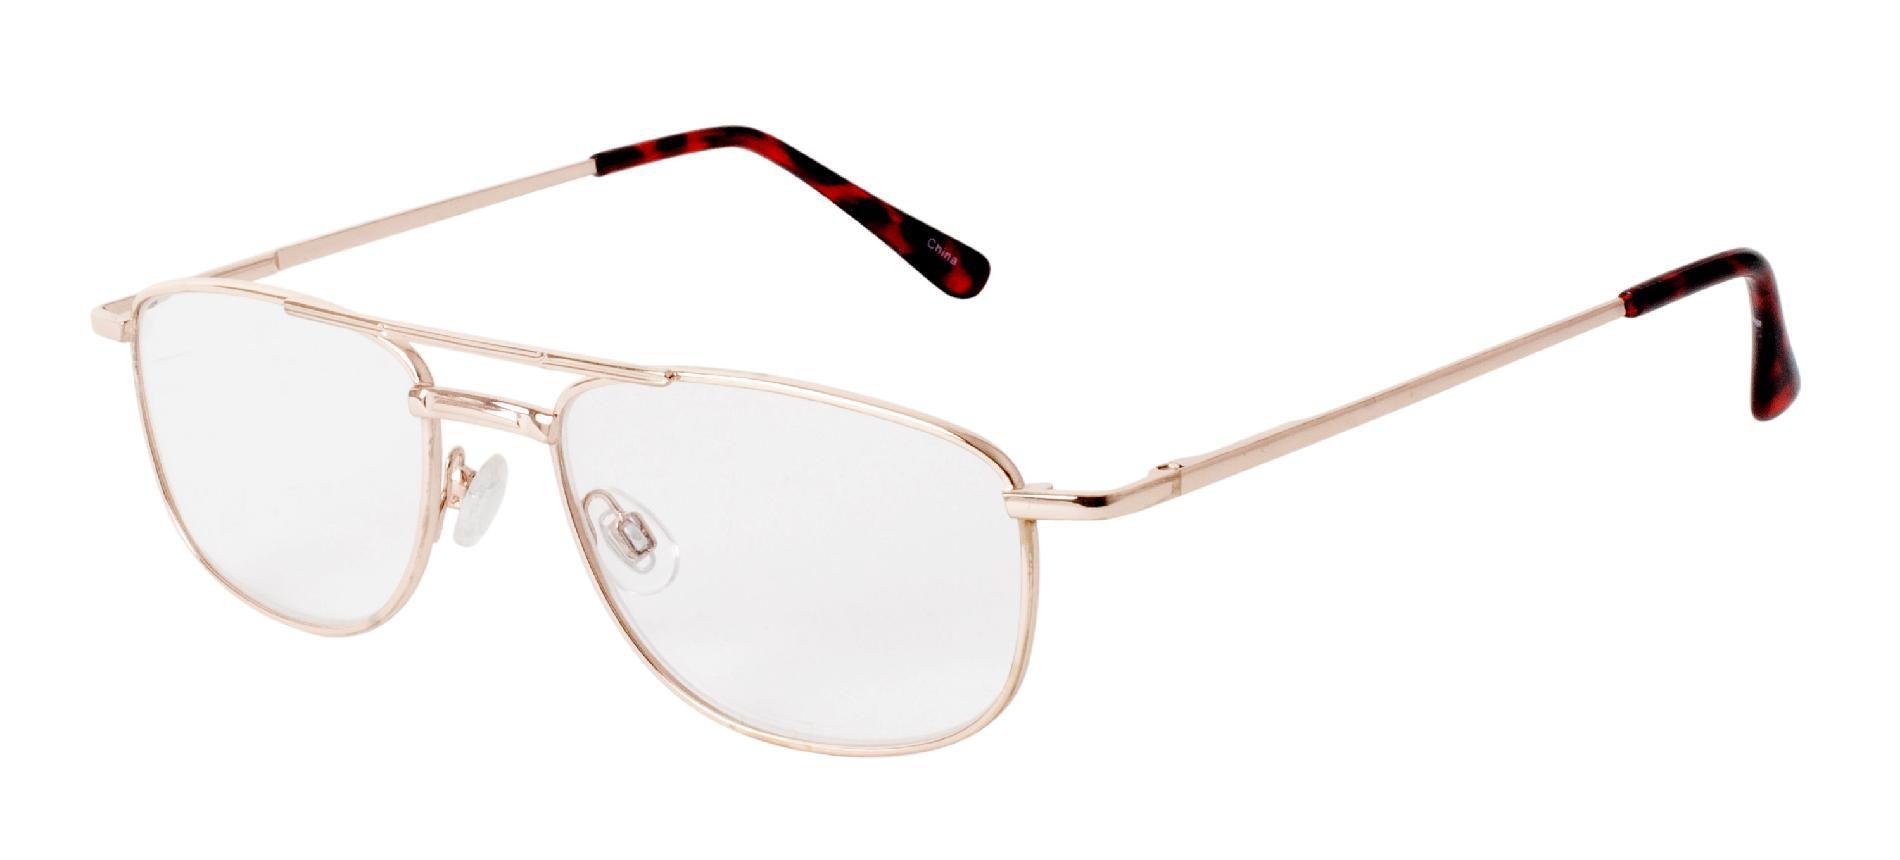 studio 1 optics men s aviator reading glasses gold 2 25